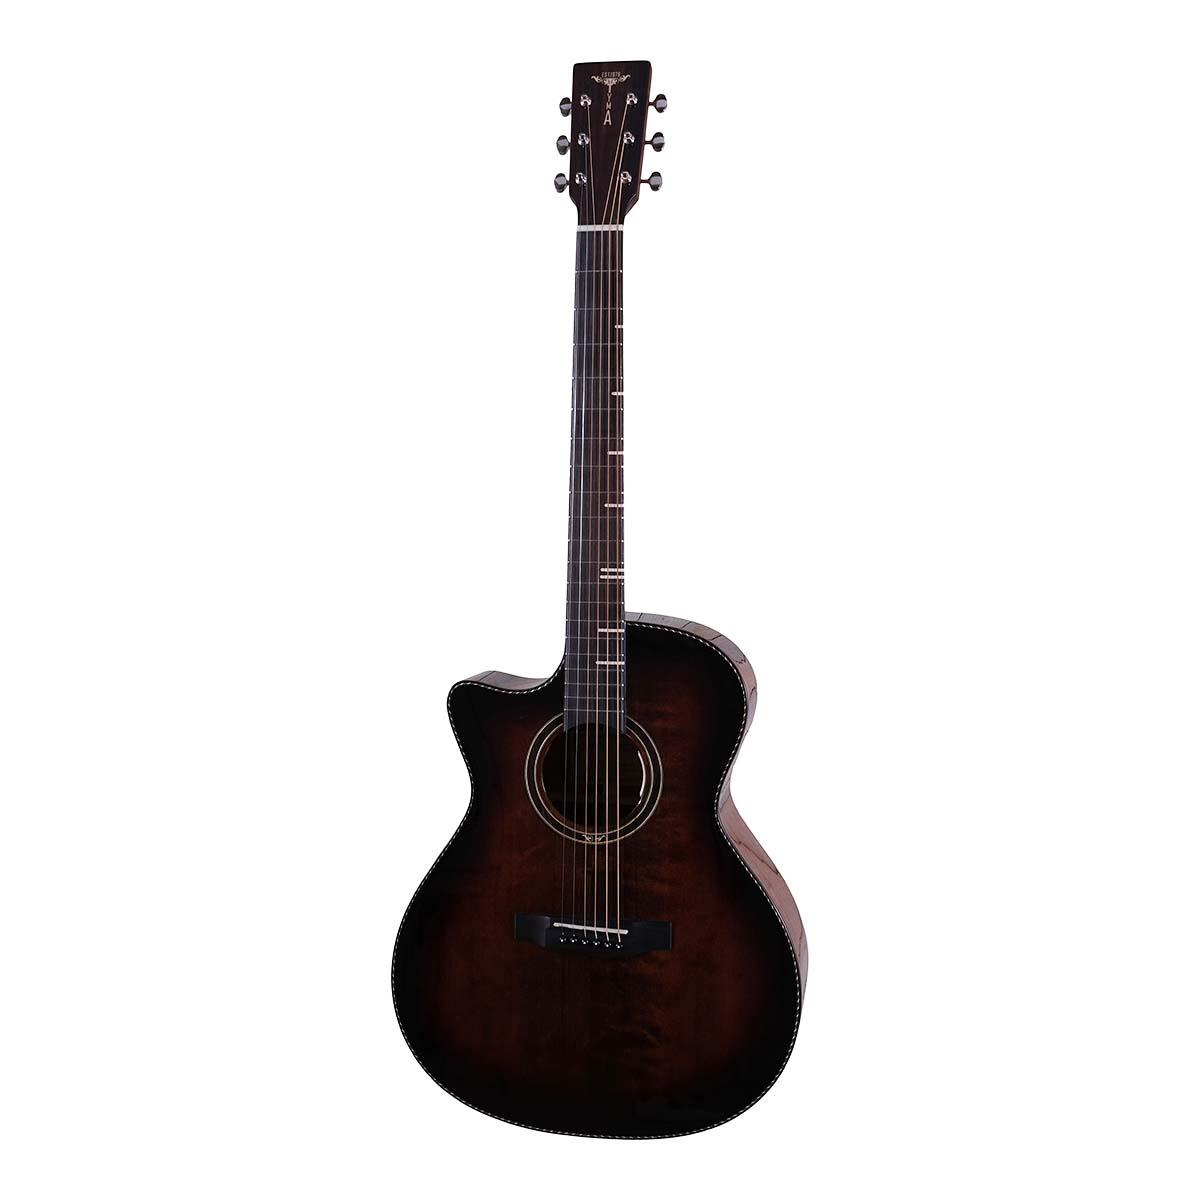 Tyma G-10E BKS LEFT western-guitar, venstrehåndet